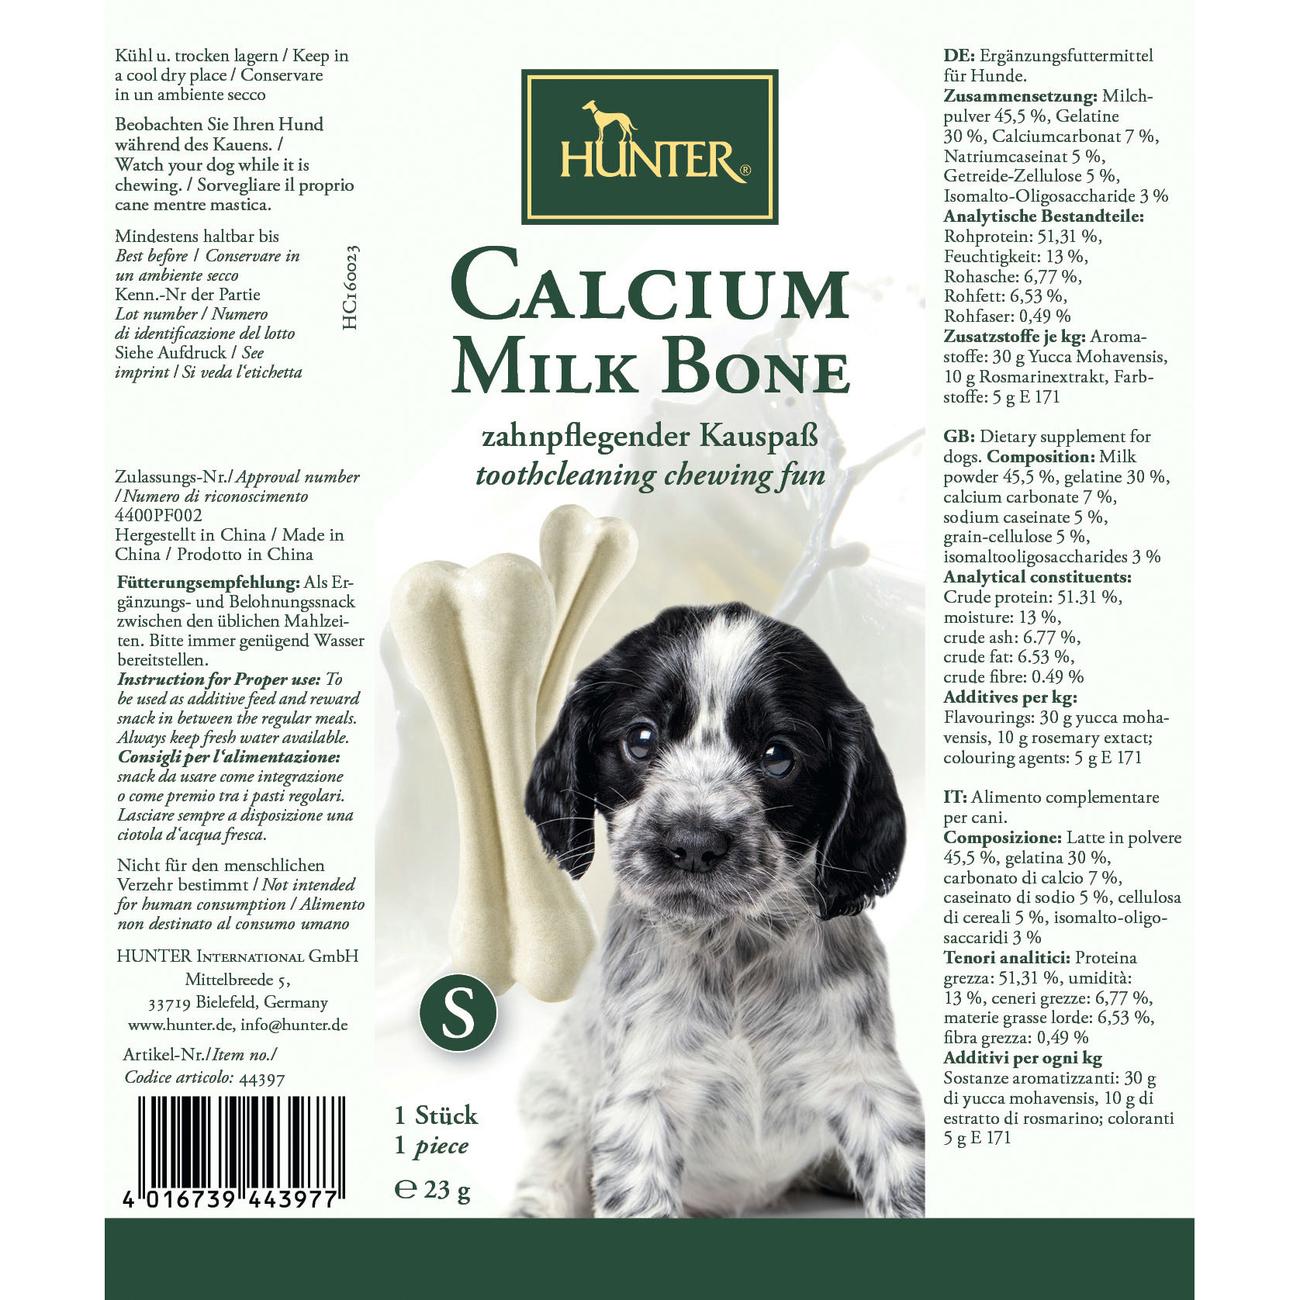 Hunter Hundeknochen Calcium Milk Bone 44397, Bild 3